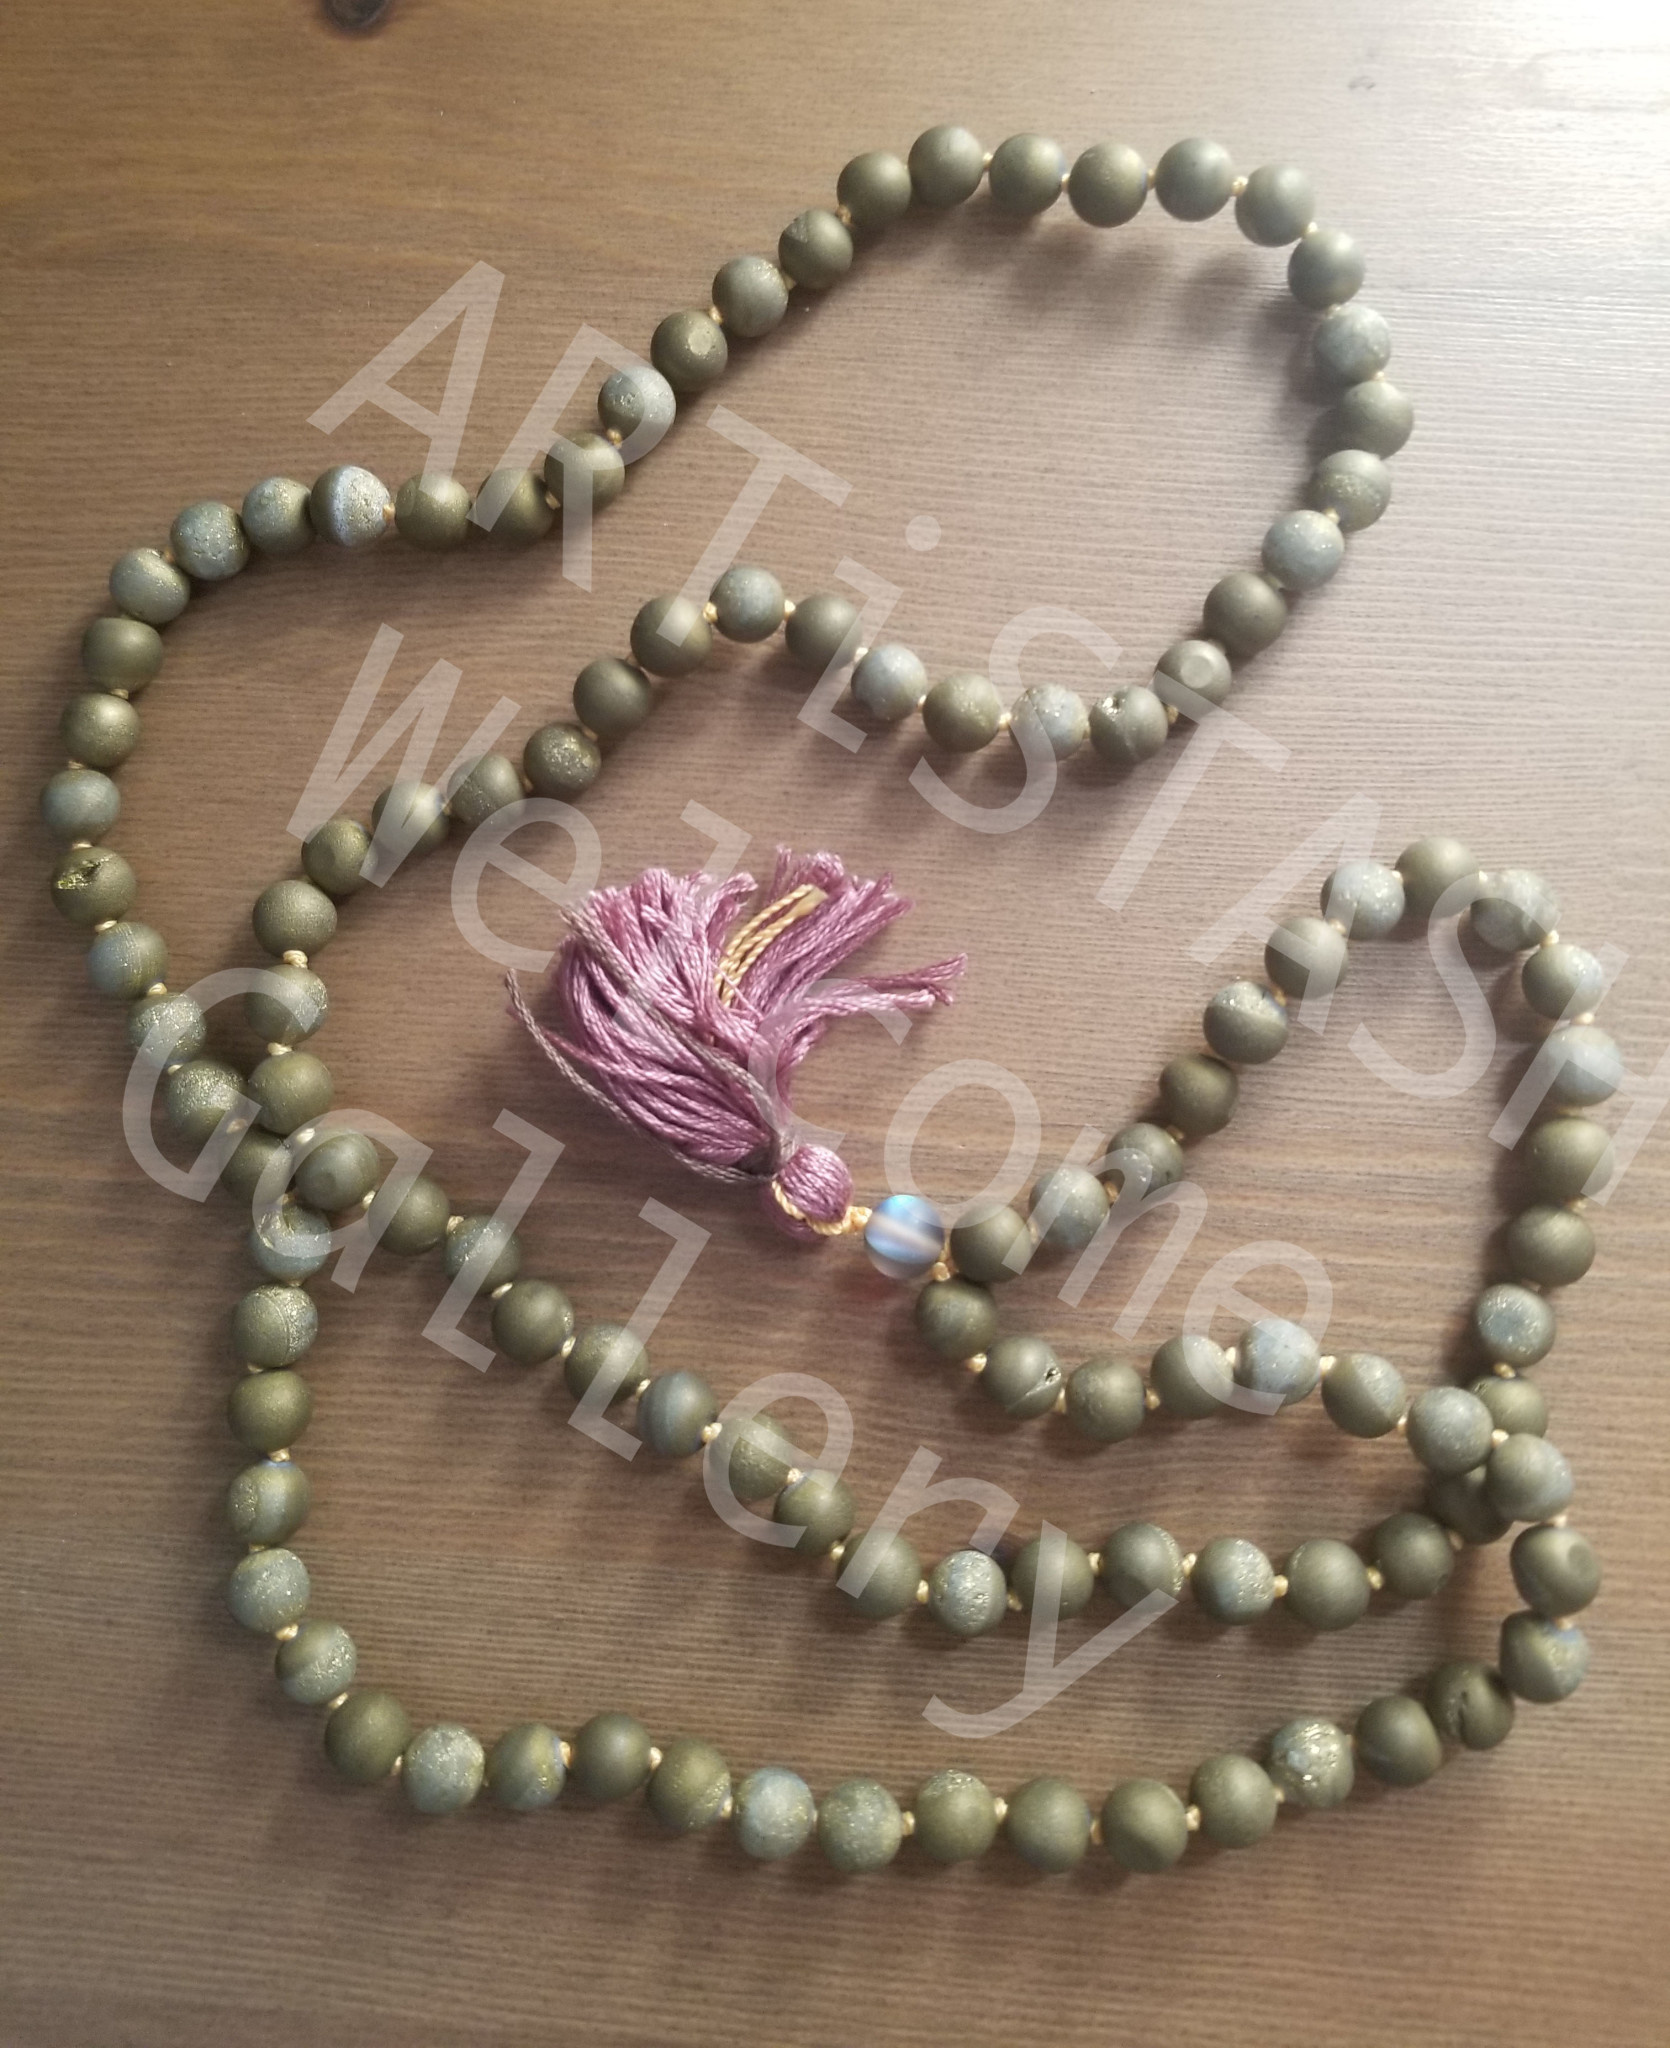 Just Sabine Mala Beads, Druzy Quartz, 108 Beads